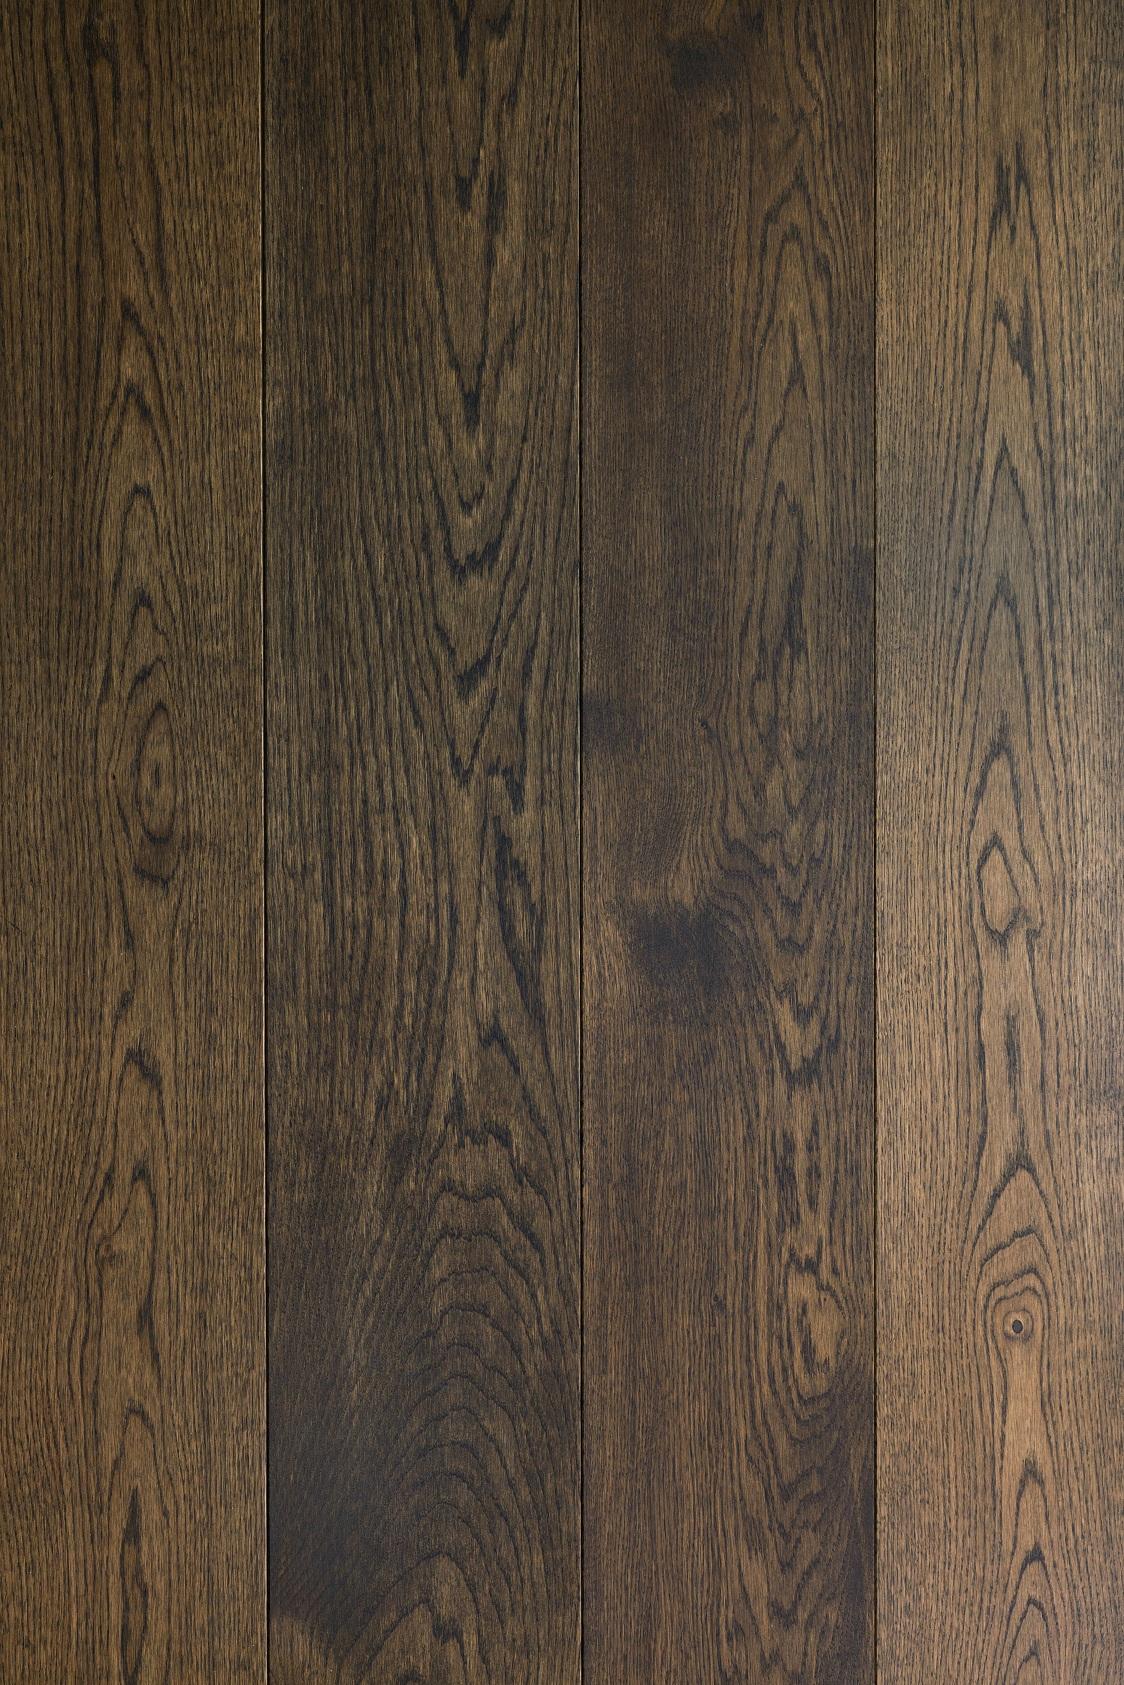 Oak Engineered Wood Flooring, Oak, Free Engine Image For User Manual Download